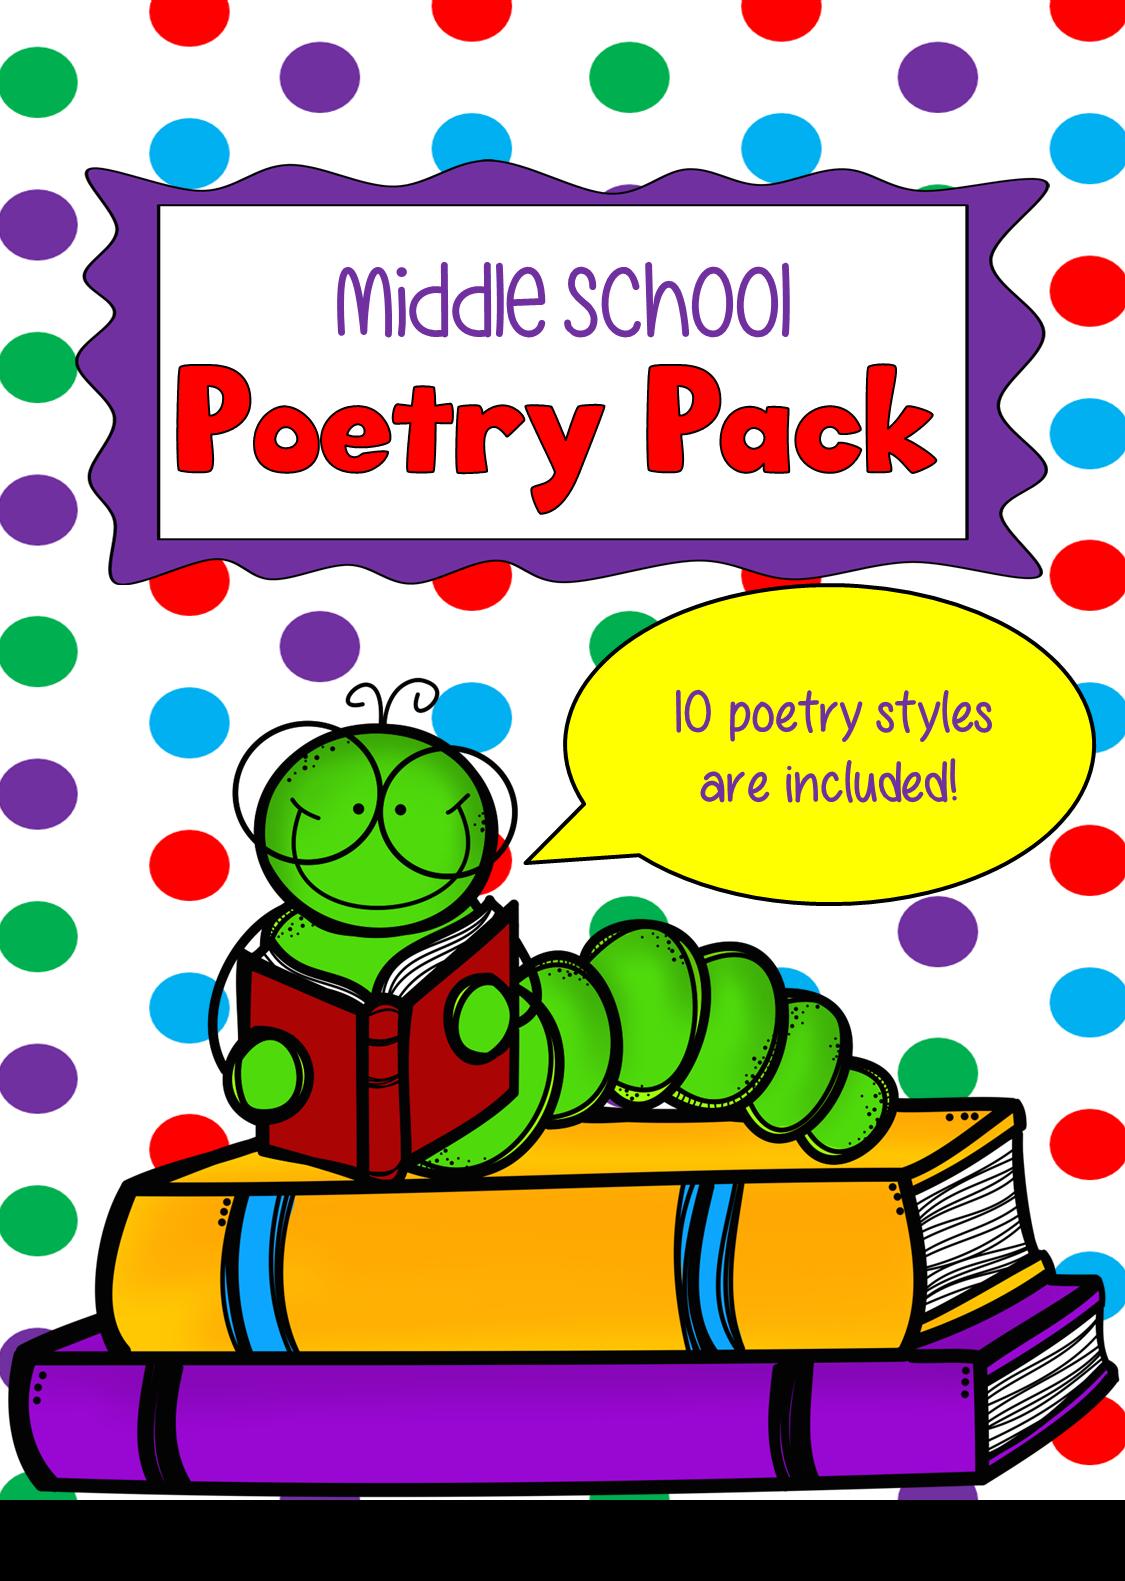 http://www.teacherspayteachers.com/Product/Middle-School-Poetry-Pack-Grades-5-9-NO-PREP-1349316